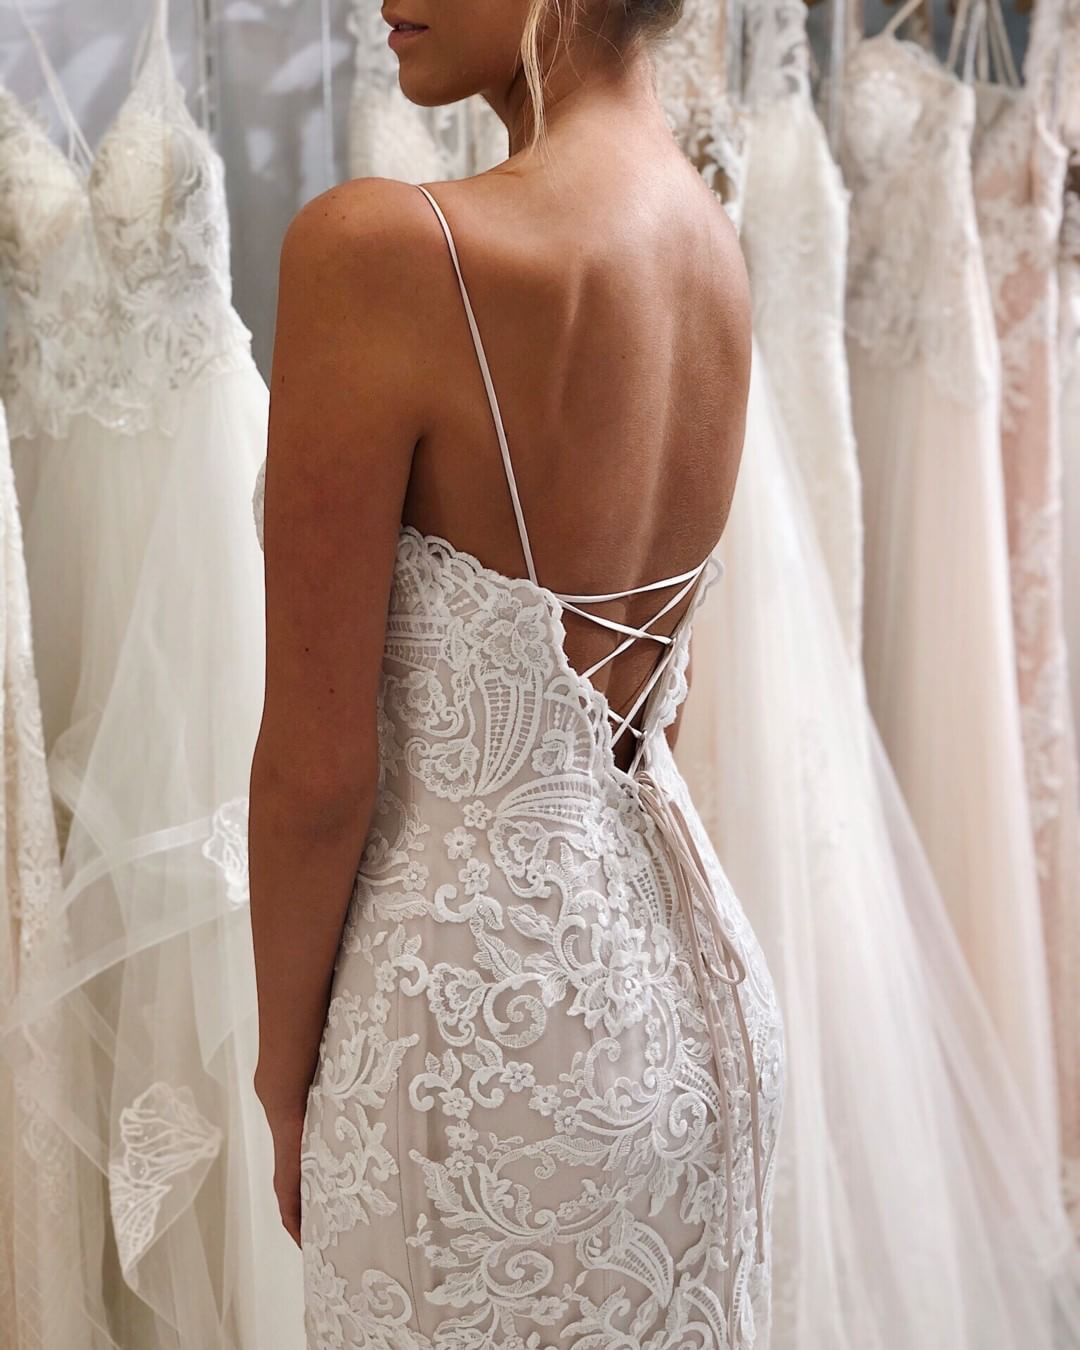 Pin On Moonlight Bridal X Bridal Musings